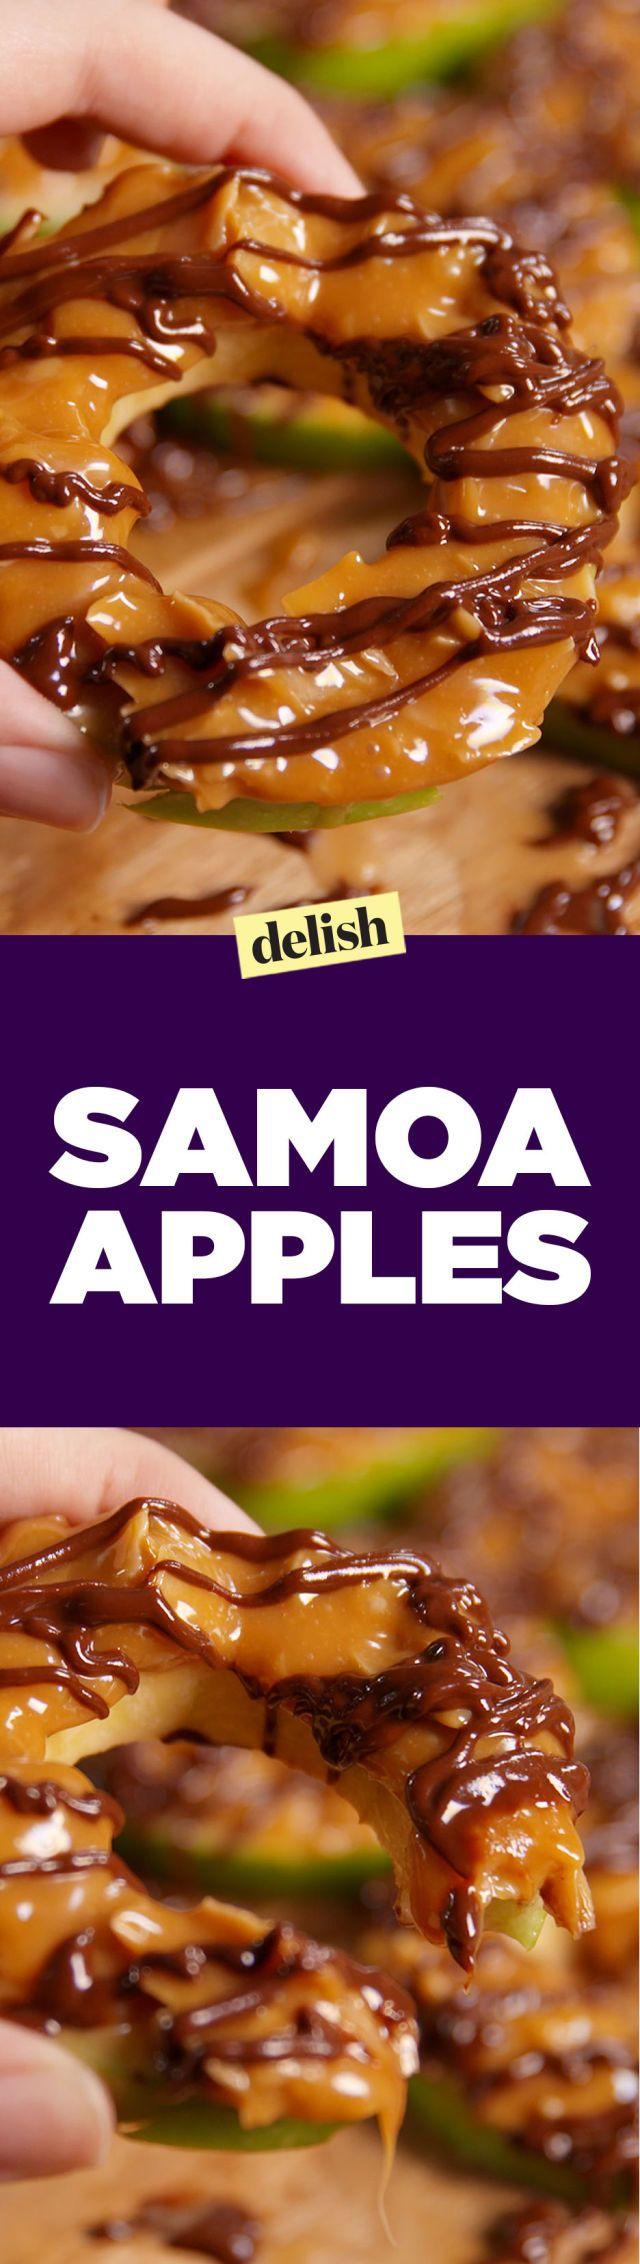 http://www.delish.com/cooking/recipe-ideas/recipes/a49792/samoa-apple-slices-recipe/